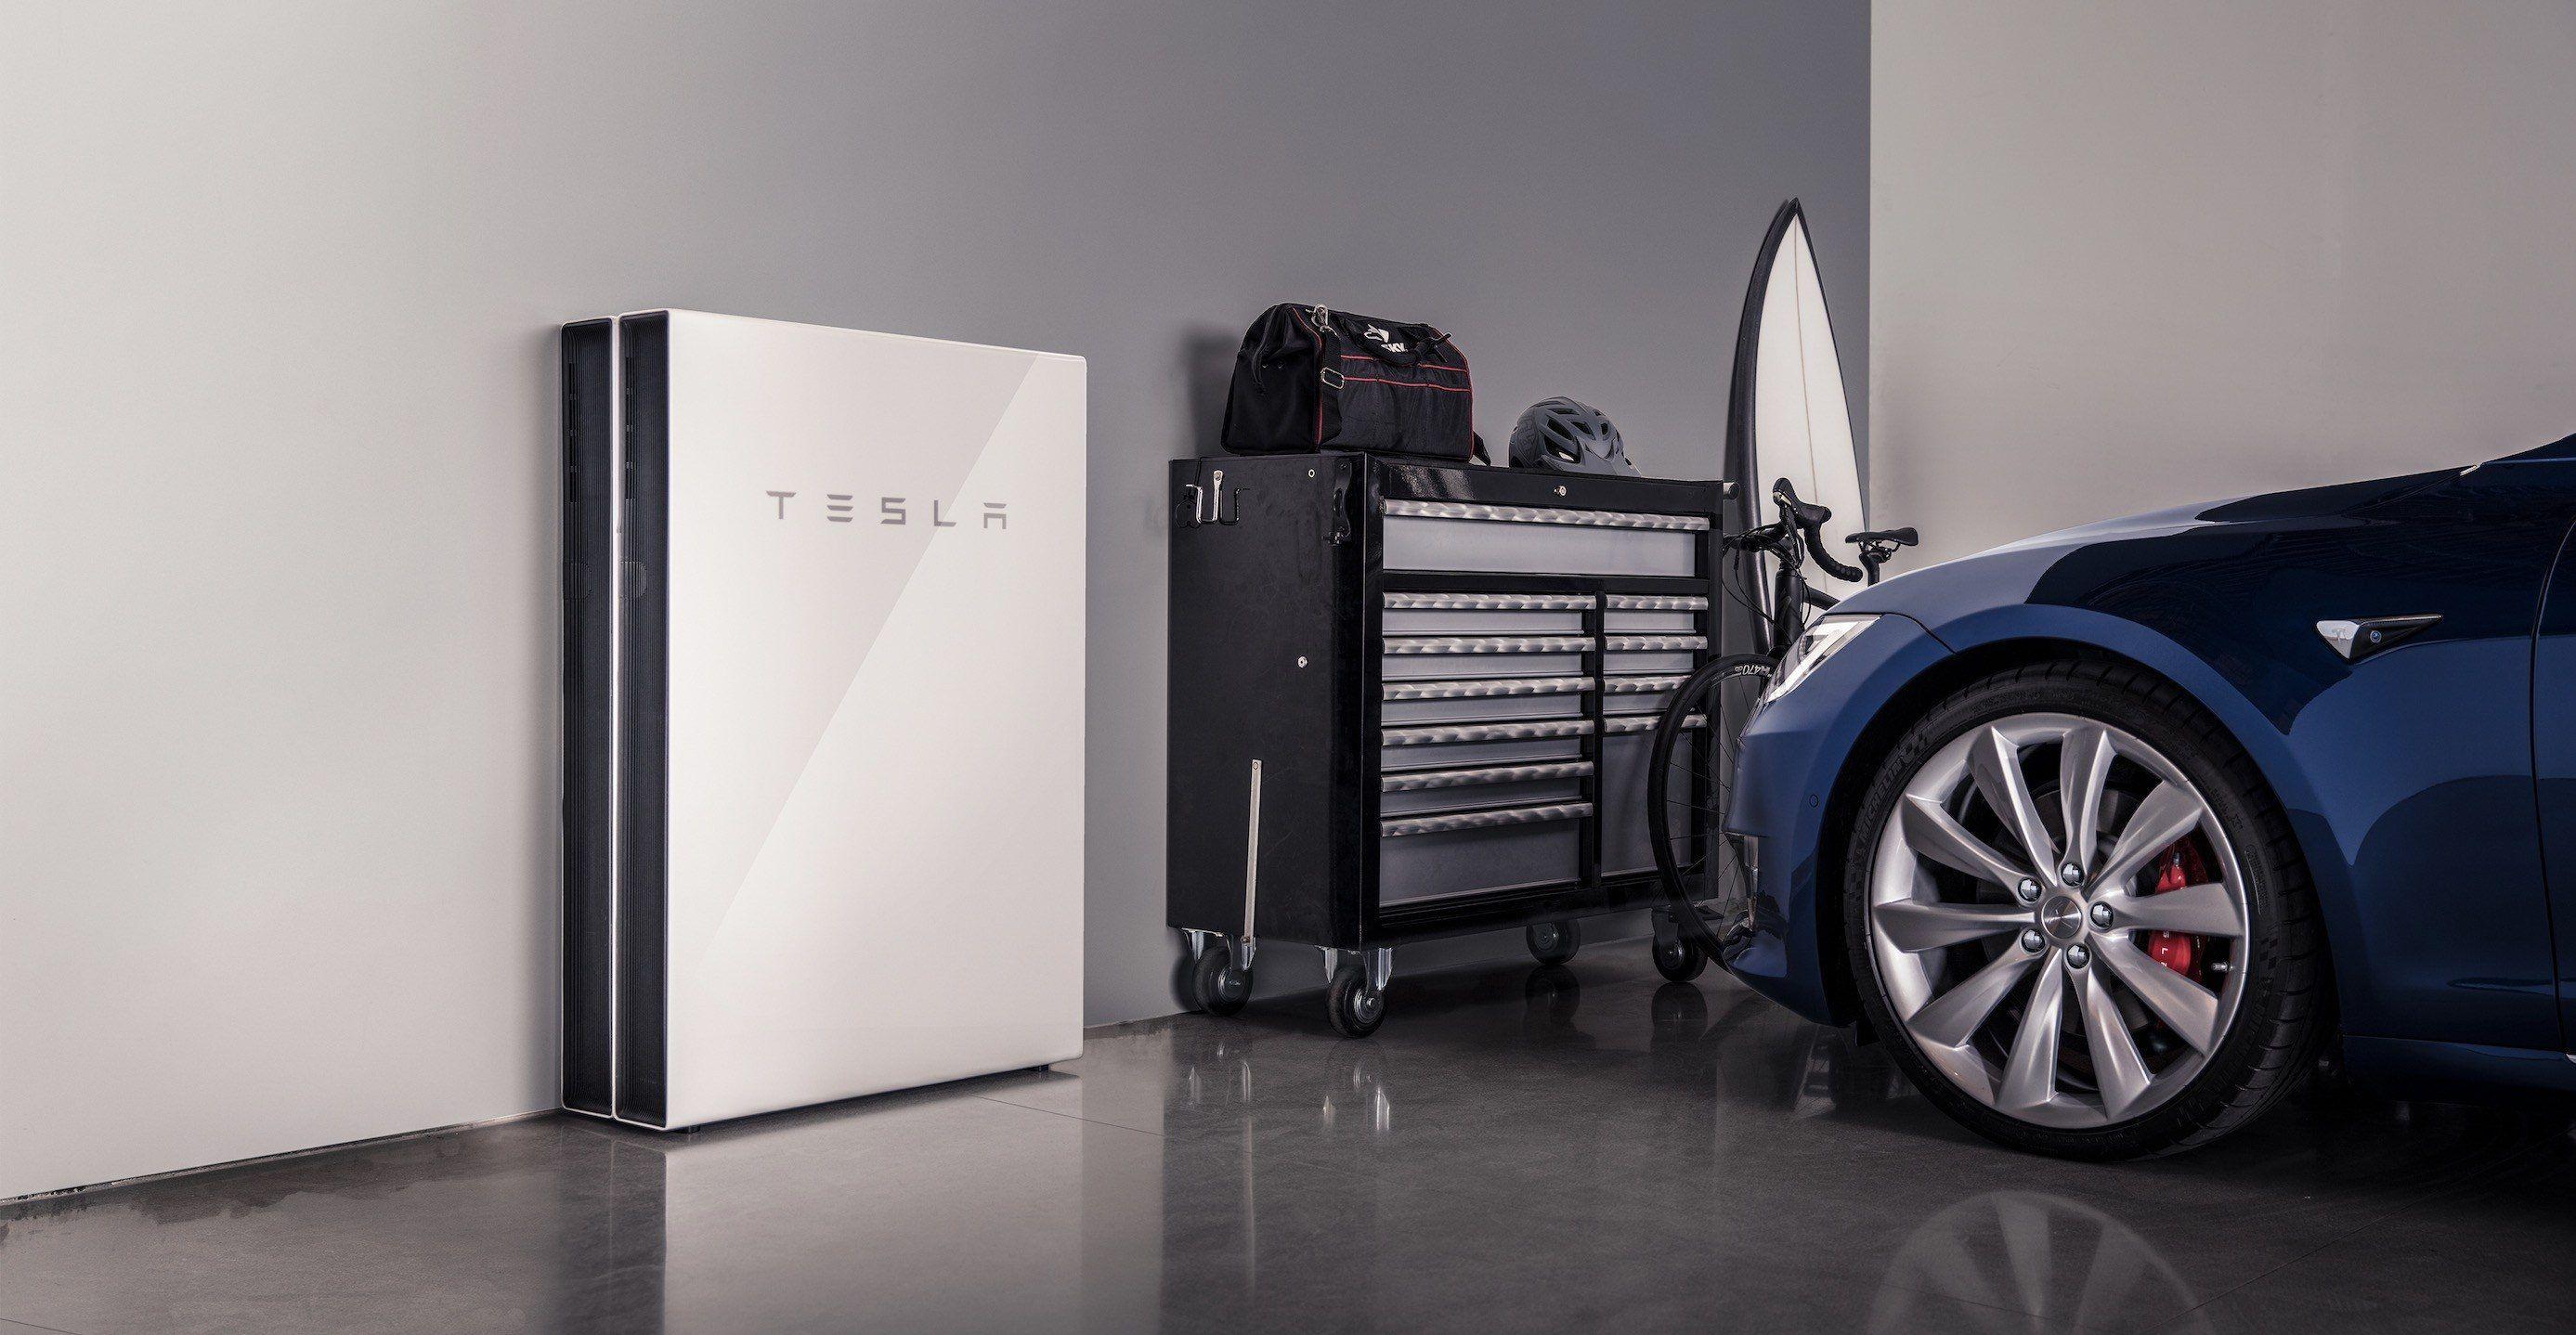 Tesla Powerwall Captures Majority Of Mindshare In Home Battery Market But Can T Deliver Report Says Electrek Tesla Powerwall Powerwall Solar Battery